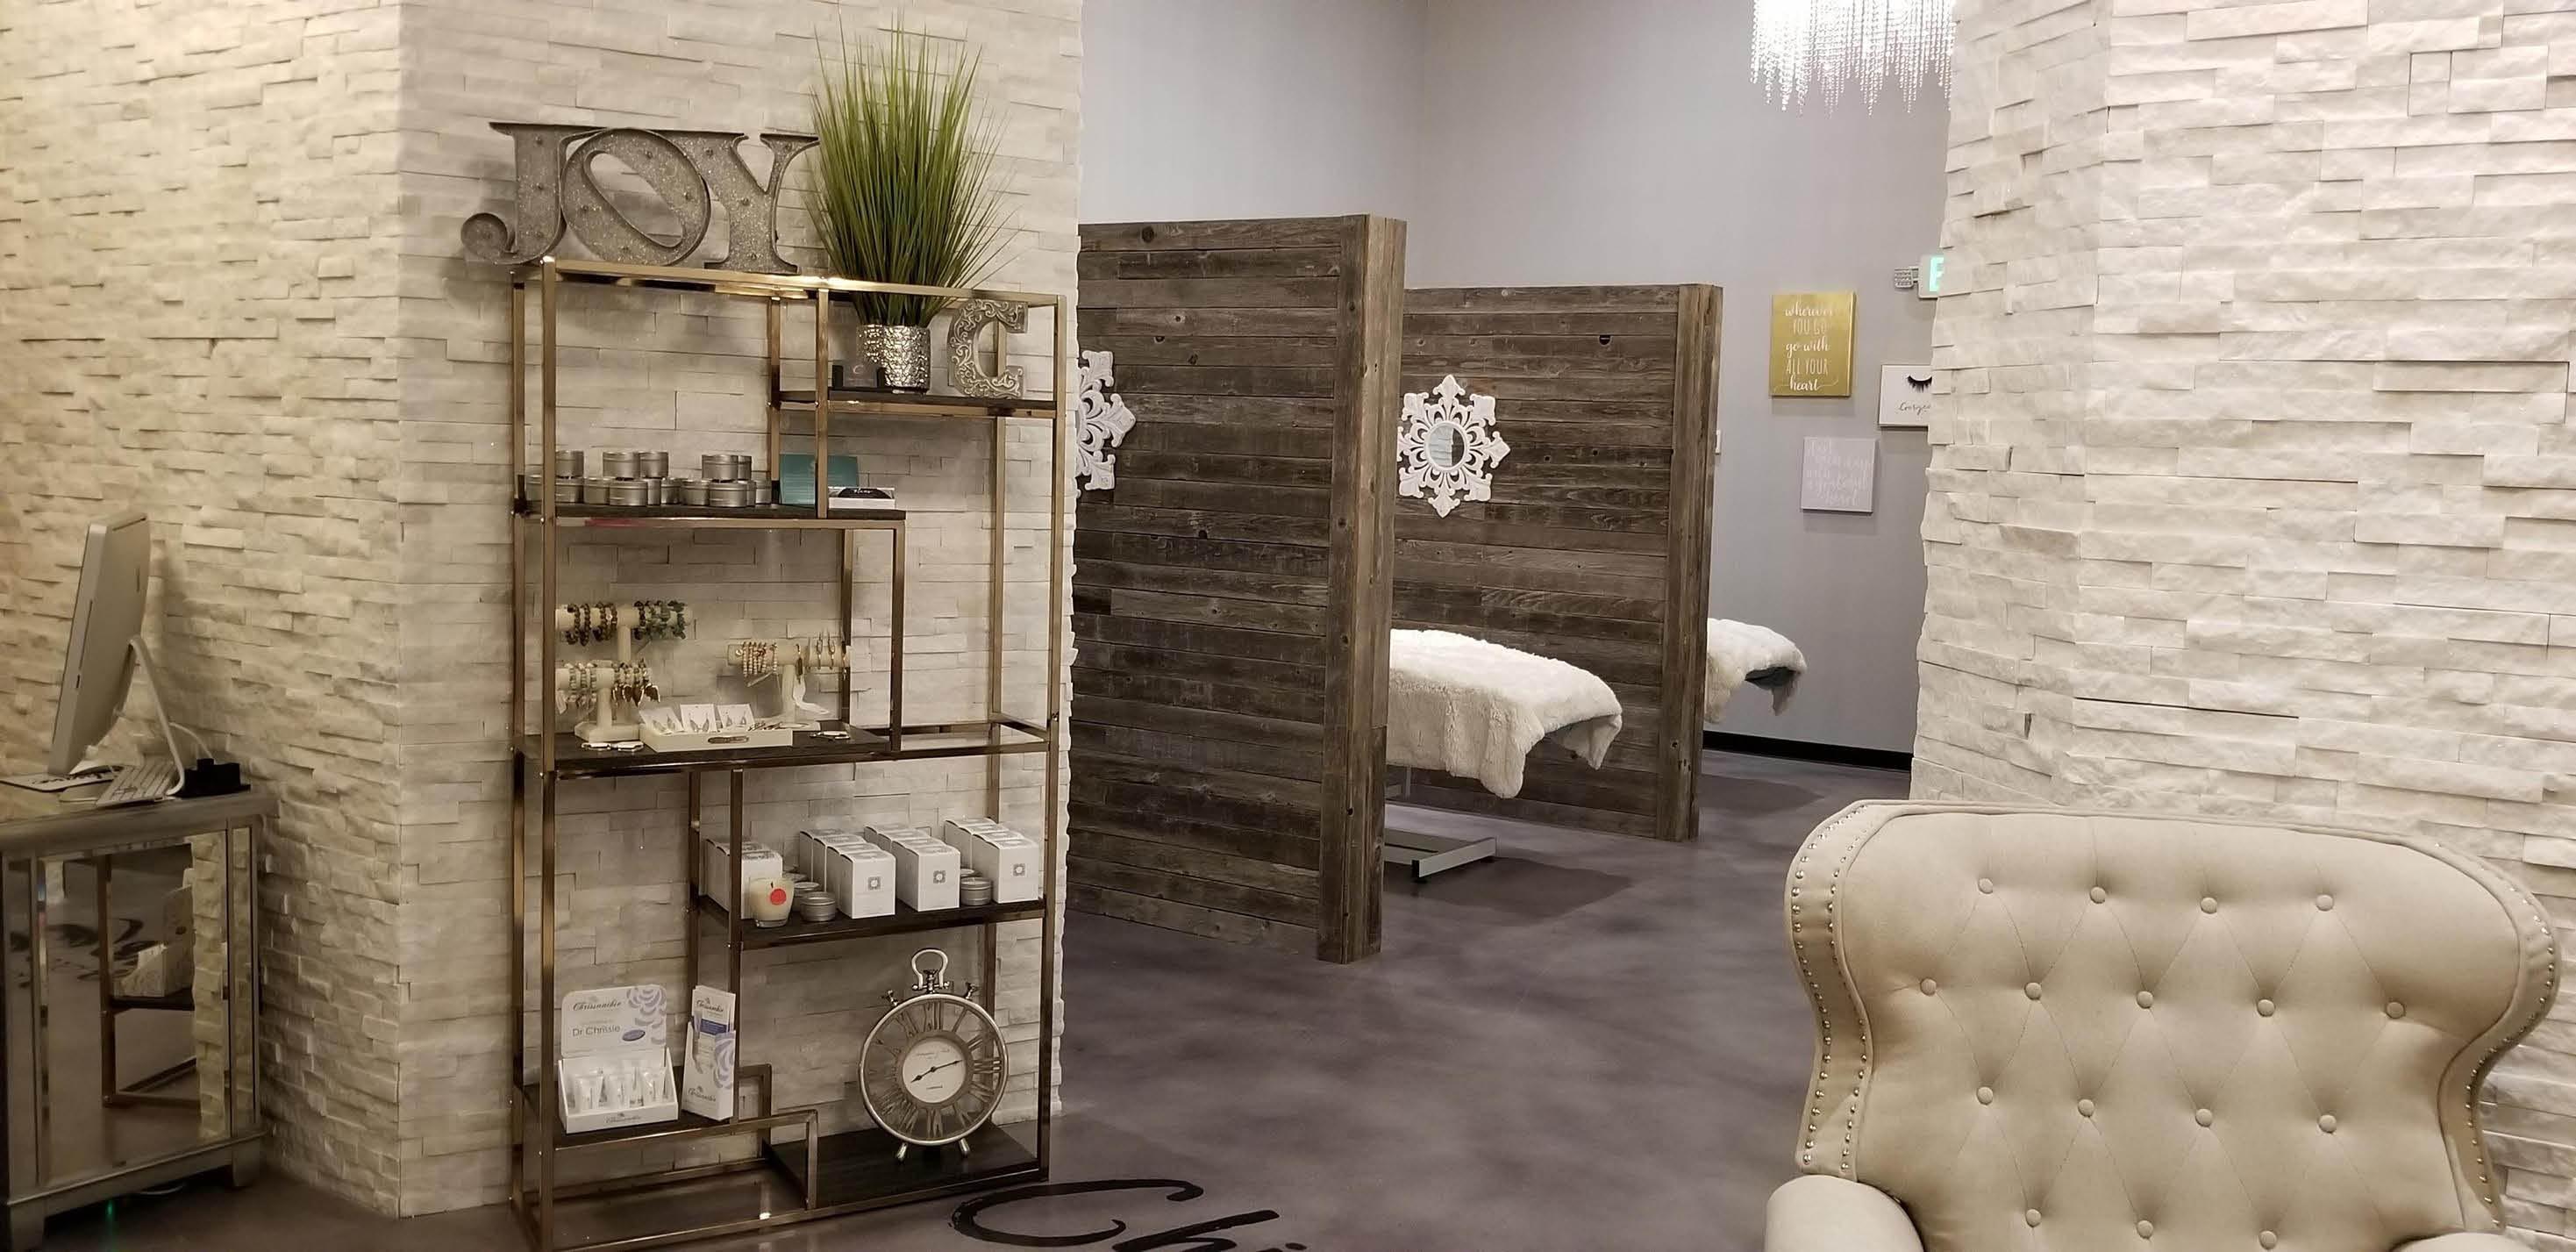 Inside Chique Lash & Brow salon in Lake Stevens, WA - eyelash extensions - eyebrow tinting - body sugaring - face sugaring - hair removal - waxing